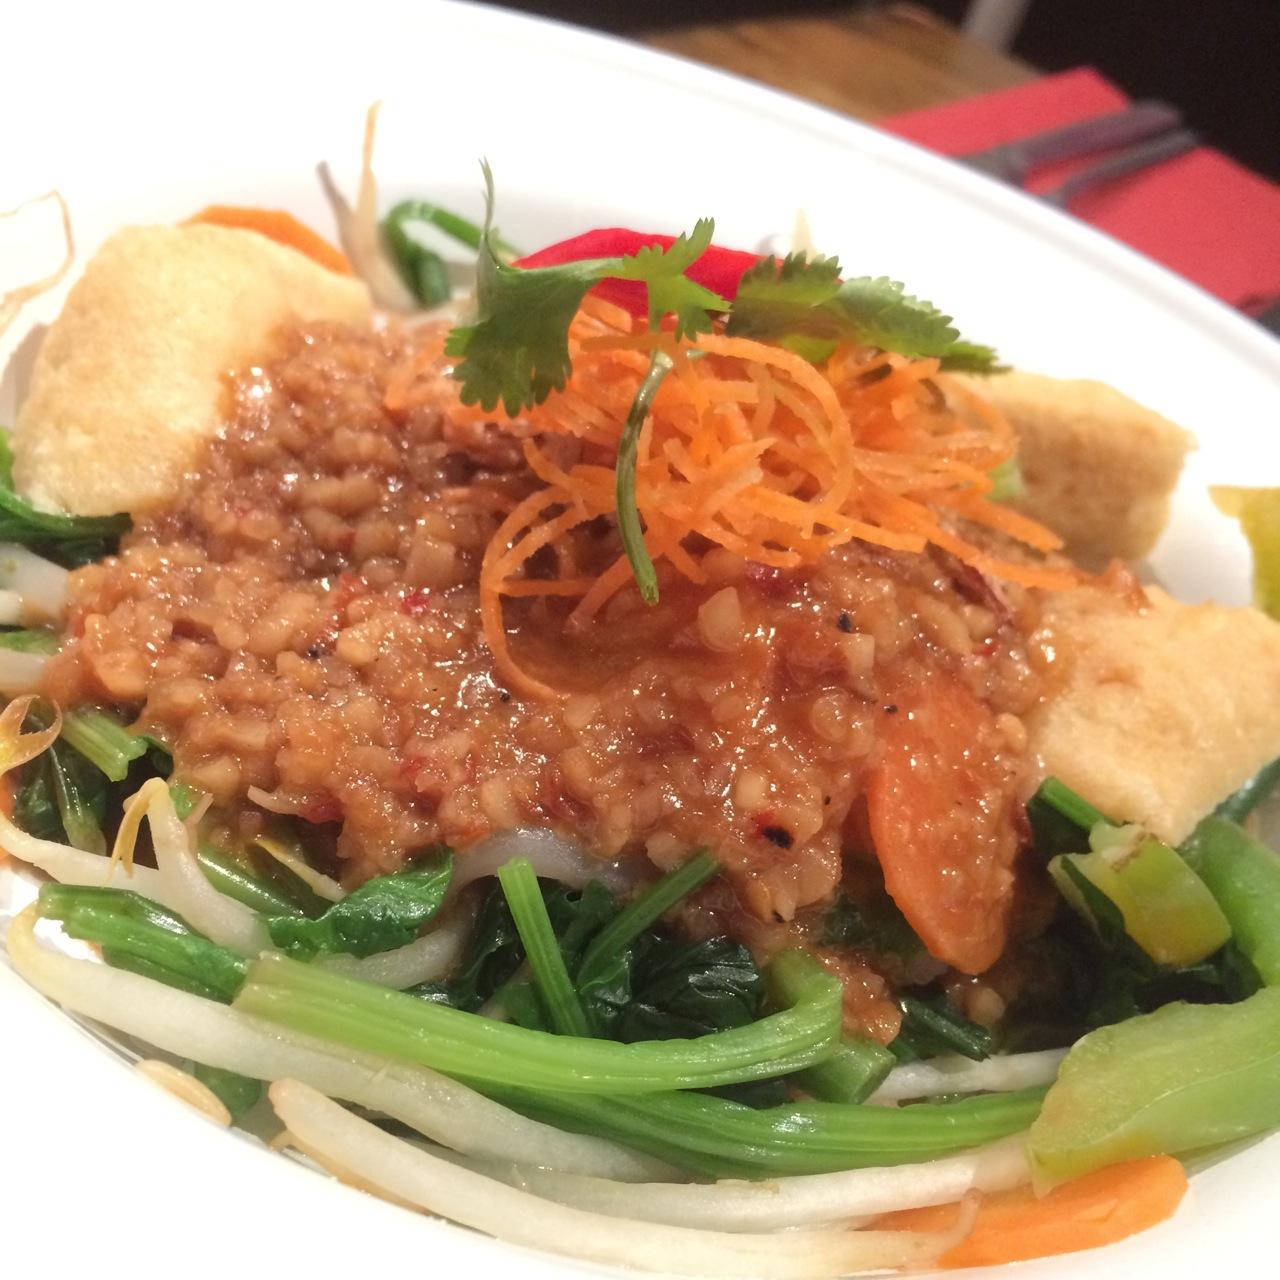 http://fatgayvegan.com/wp-content/uploads/2015/12/Ning-vegan-salad.jpg